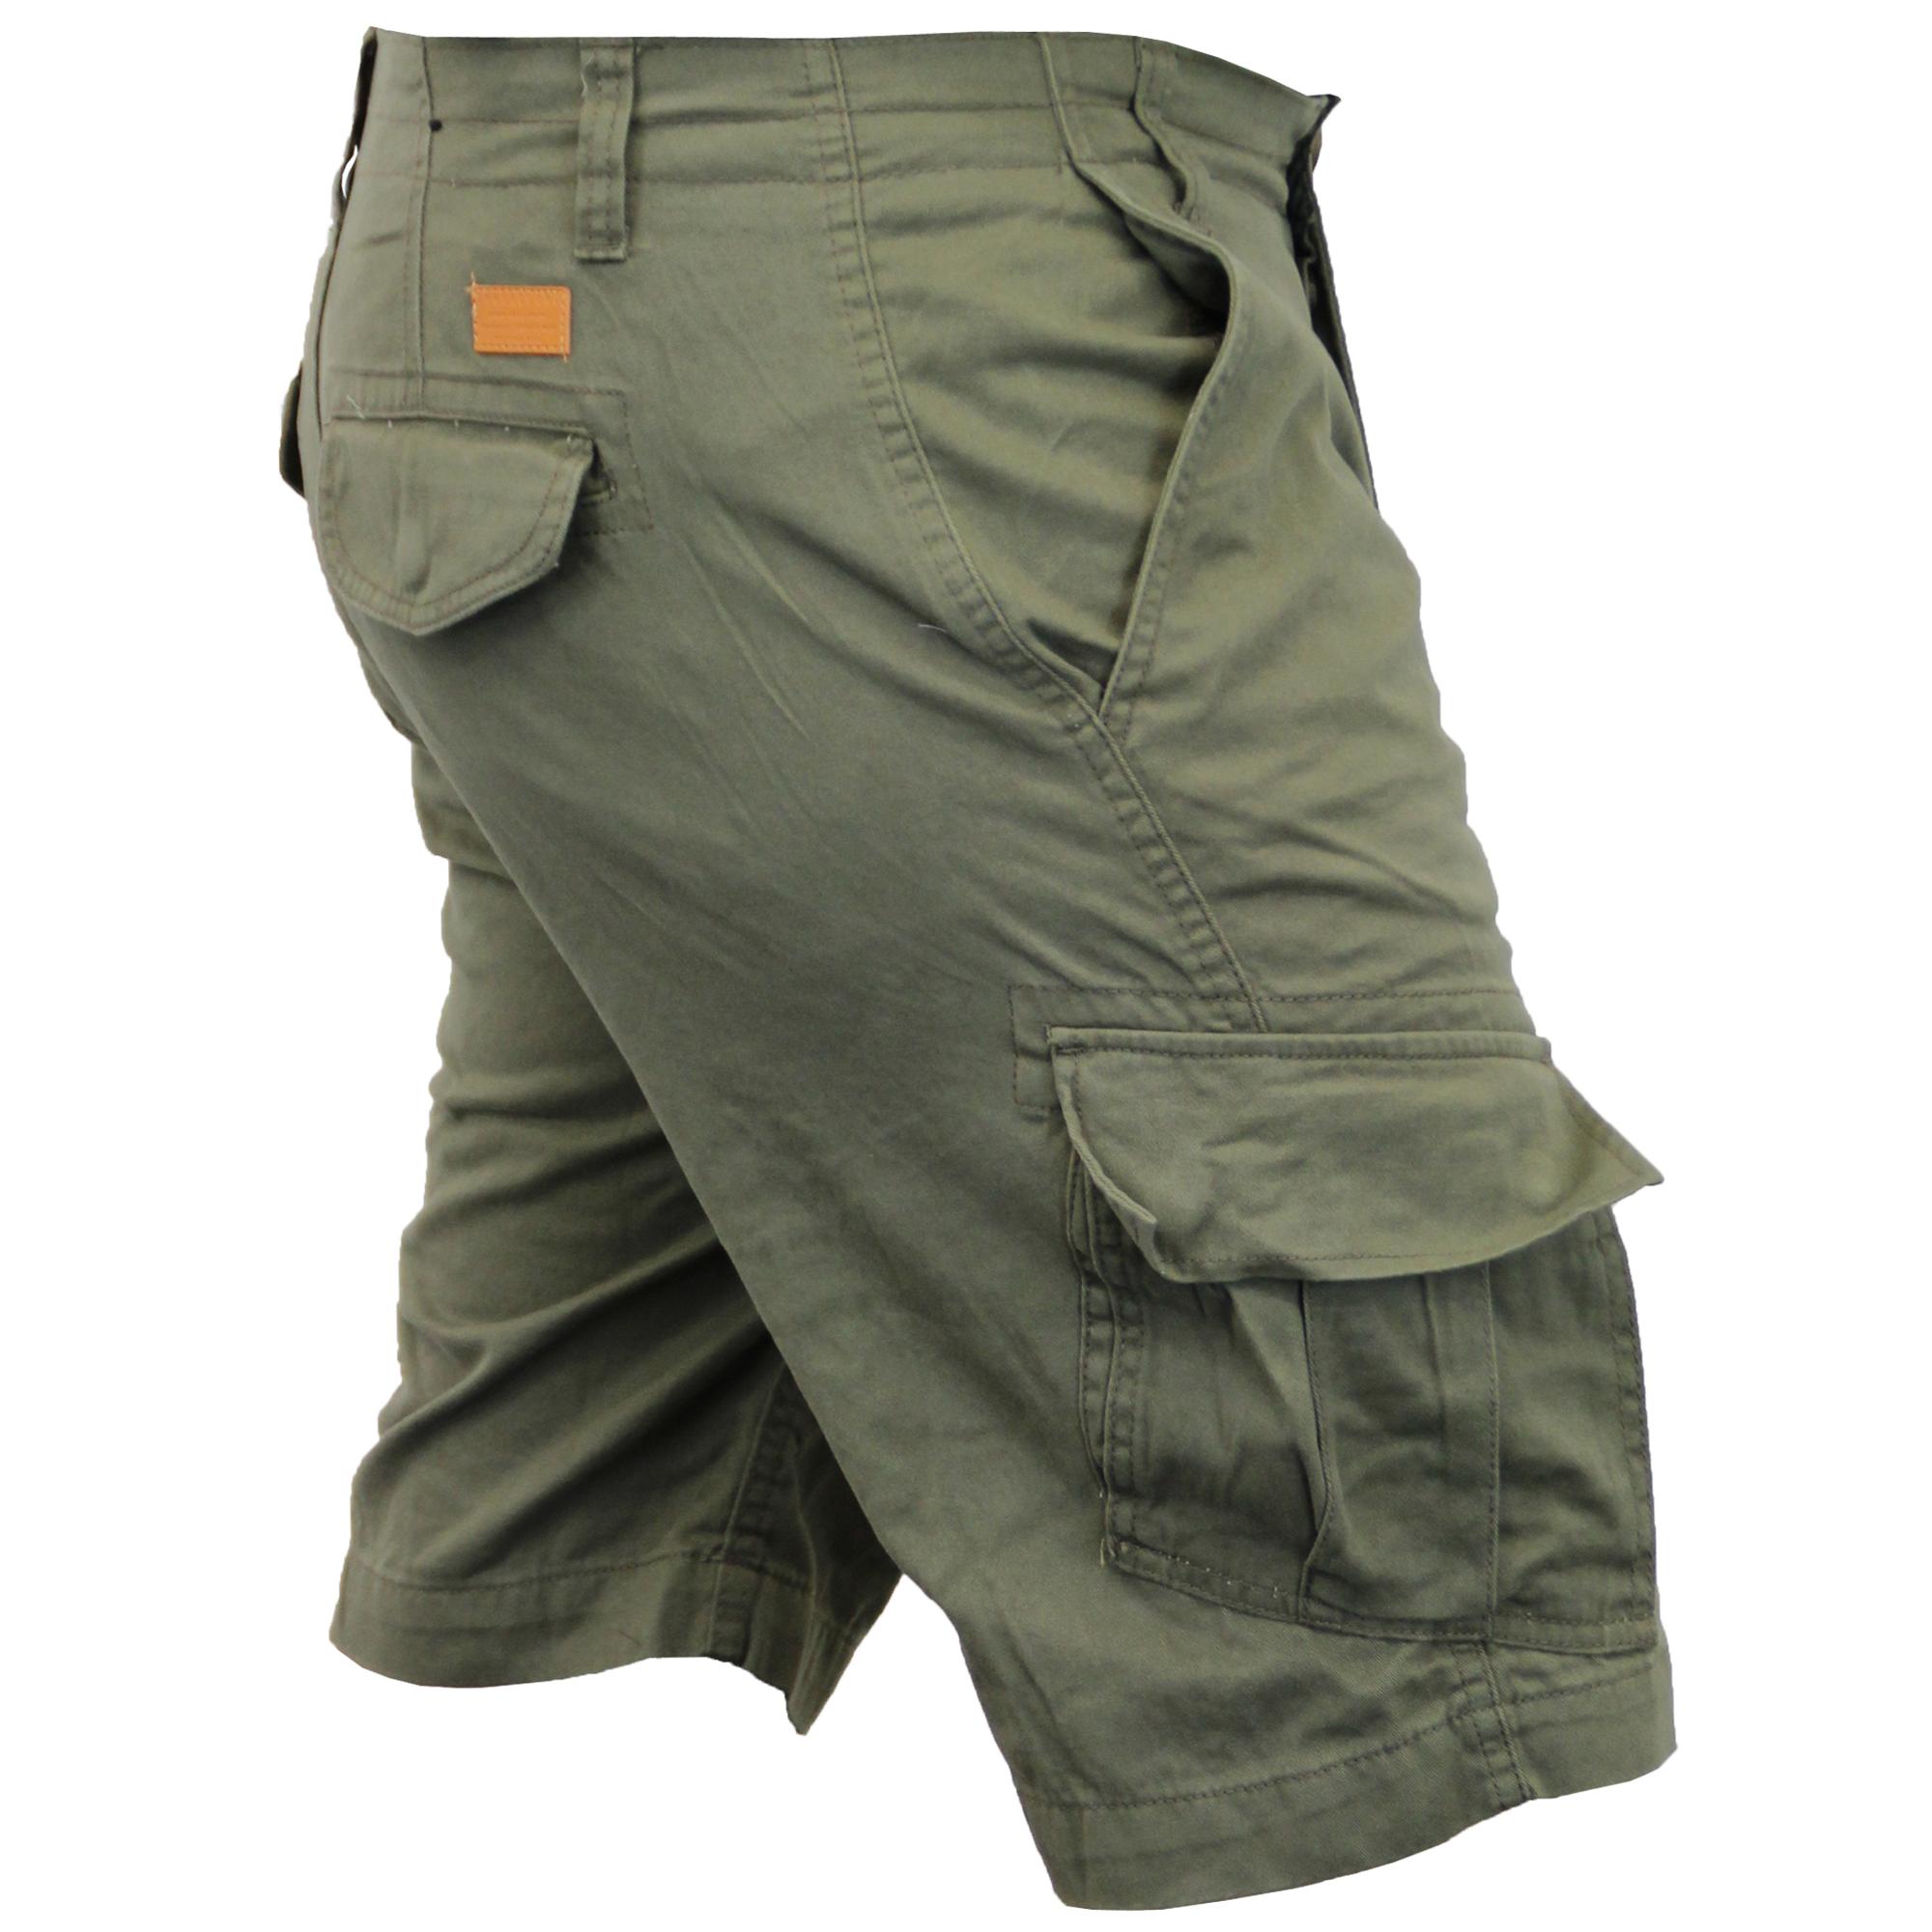 Mens-Cargo-Chino-Shorts-Threadbare-Combat-Knee-Length-Westace-Military-Summer thumbnail 17